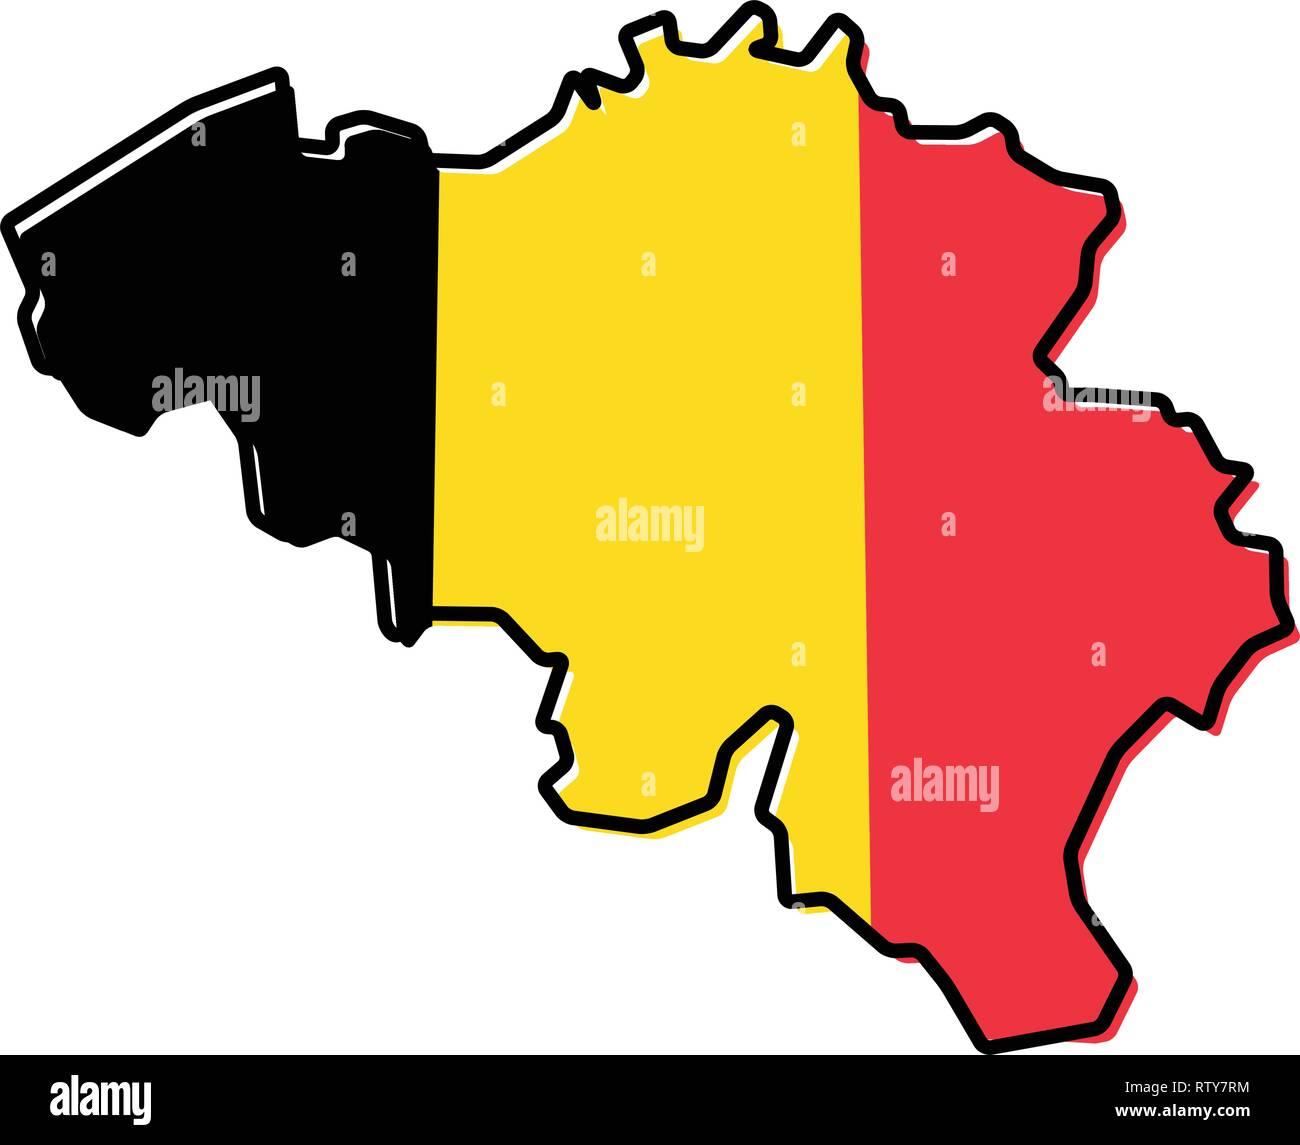 Belgien Karte Umriss.Belgien Umriss Stockfotos Belgien Umriss Bilder Alamy